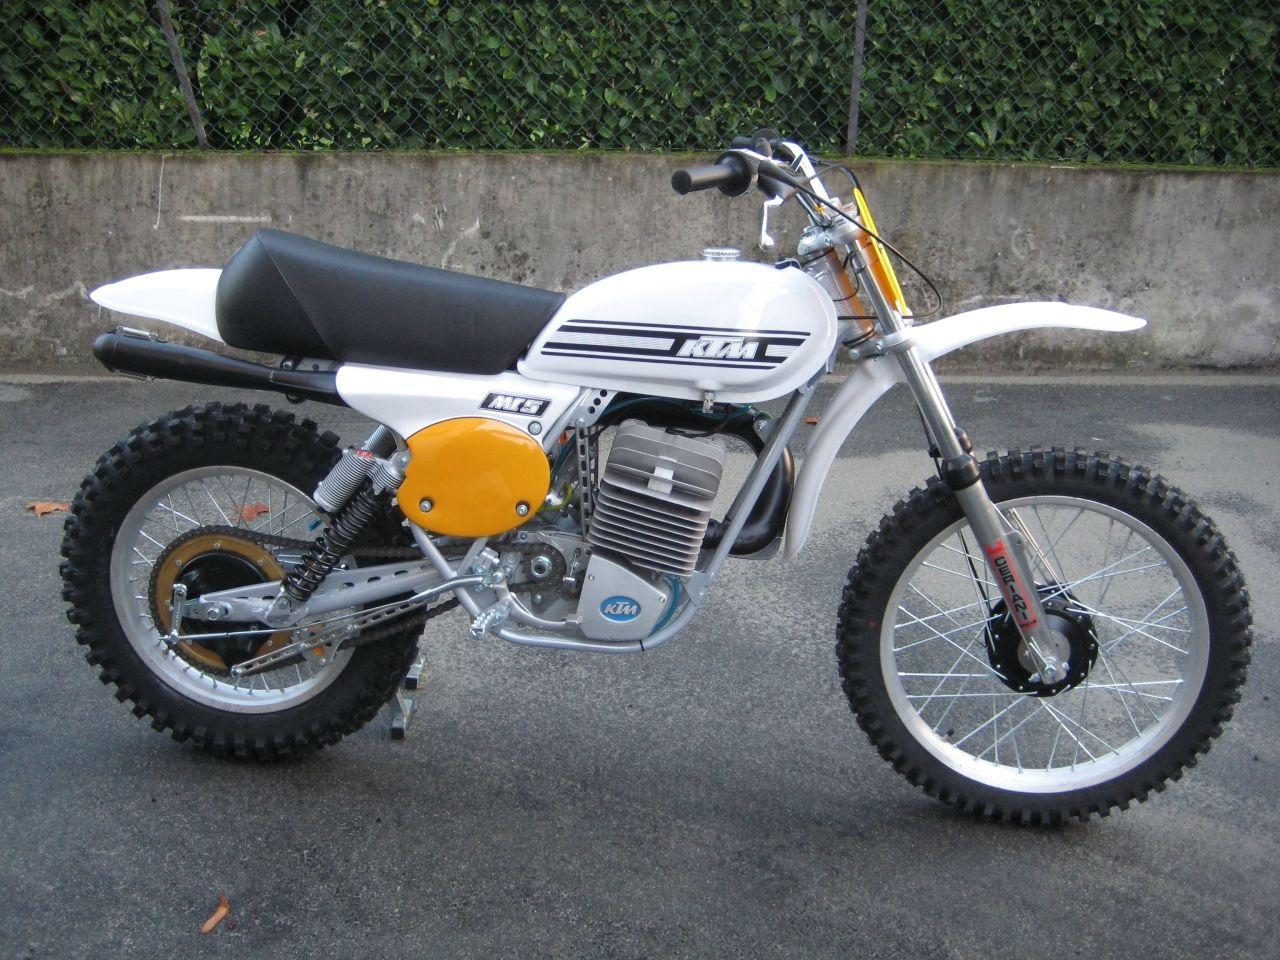 Ktm Mc 400 1976 Enduro Motorcycle Vintage Motocross Ktm Dirt Bikes